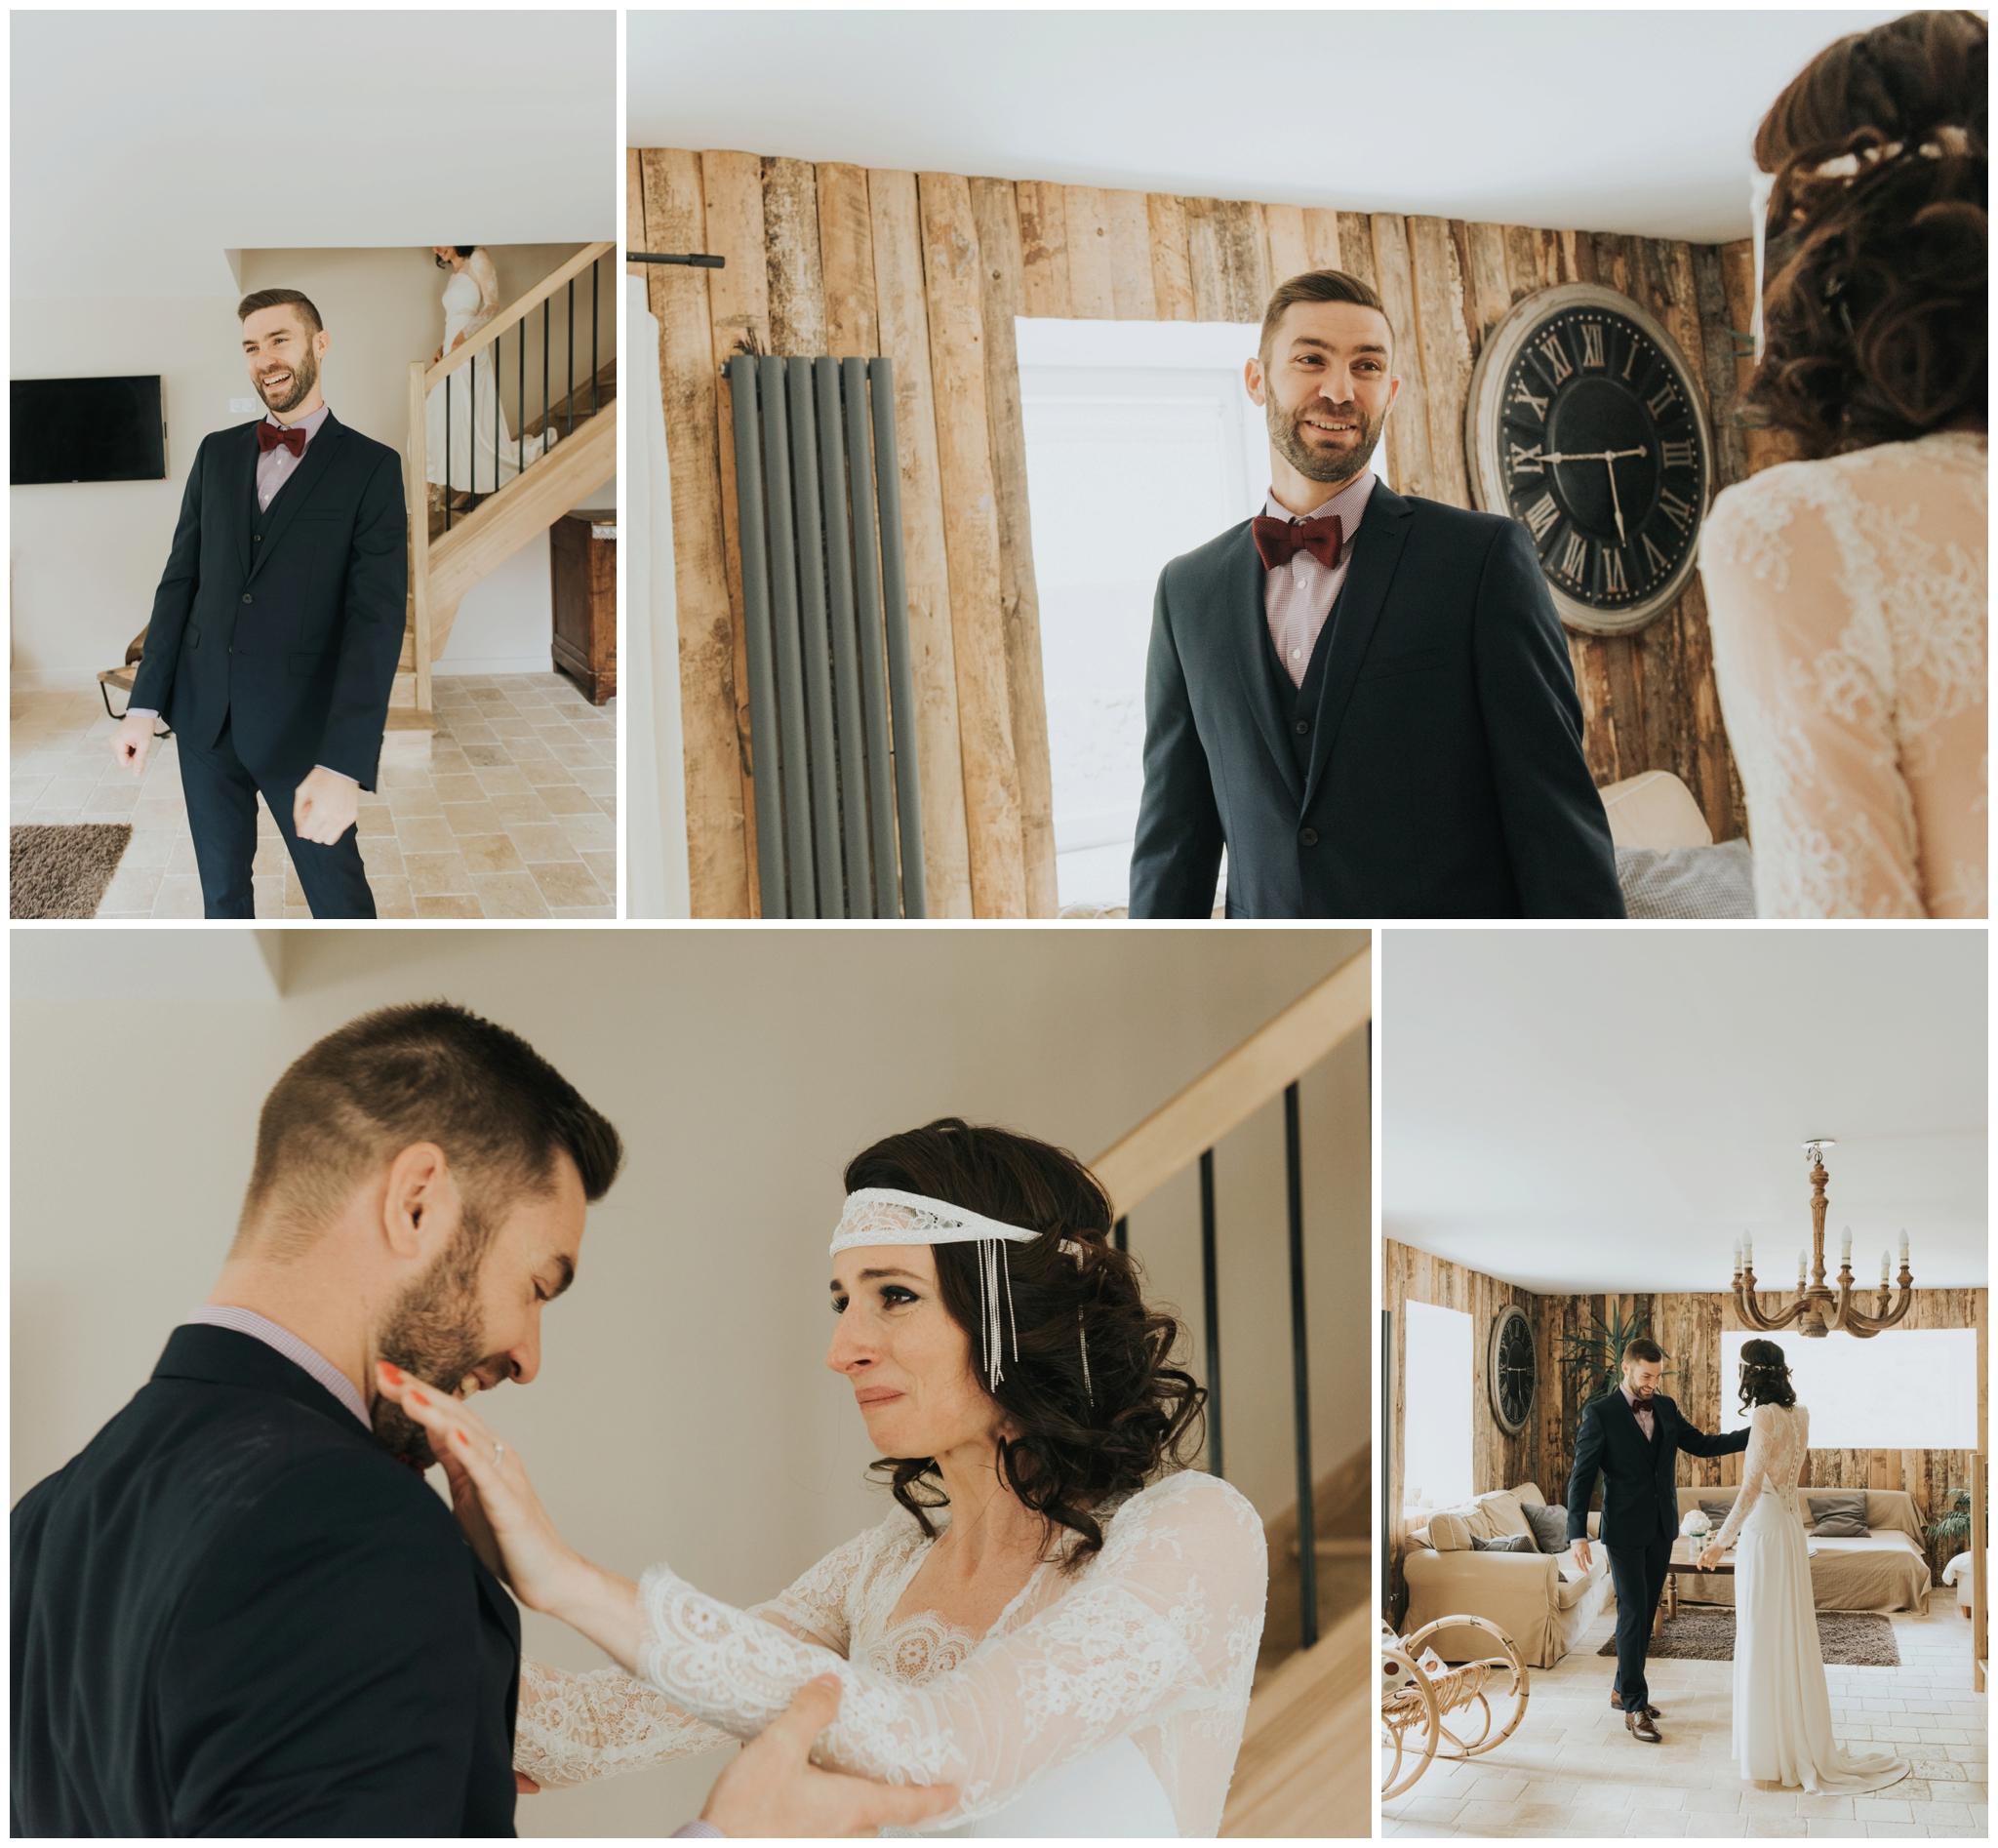 photographe-mariage-montagne-vercors-boho-folk-grenoble-annecy-alpes_0028